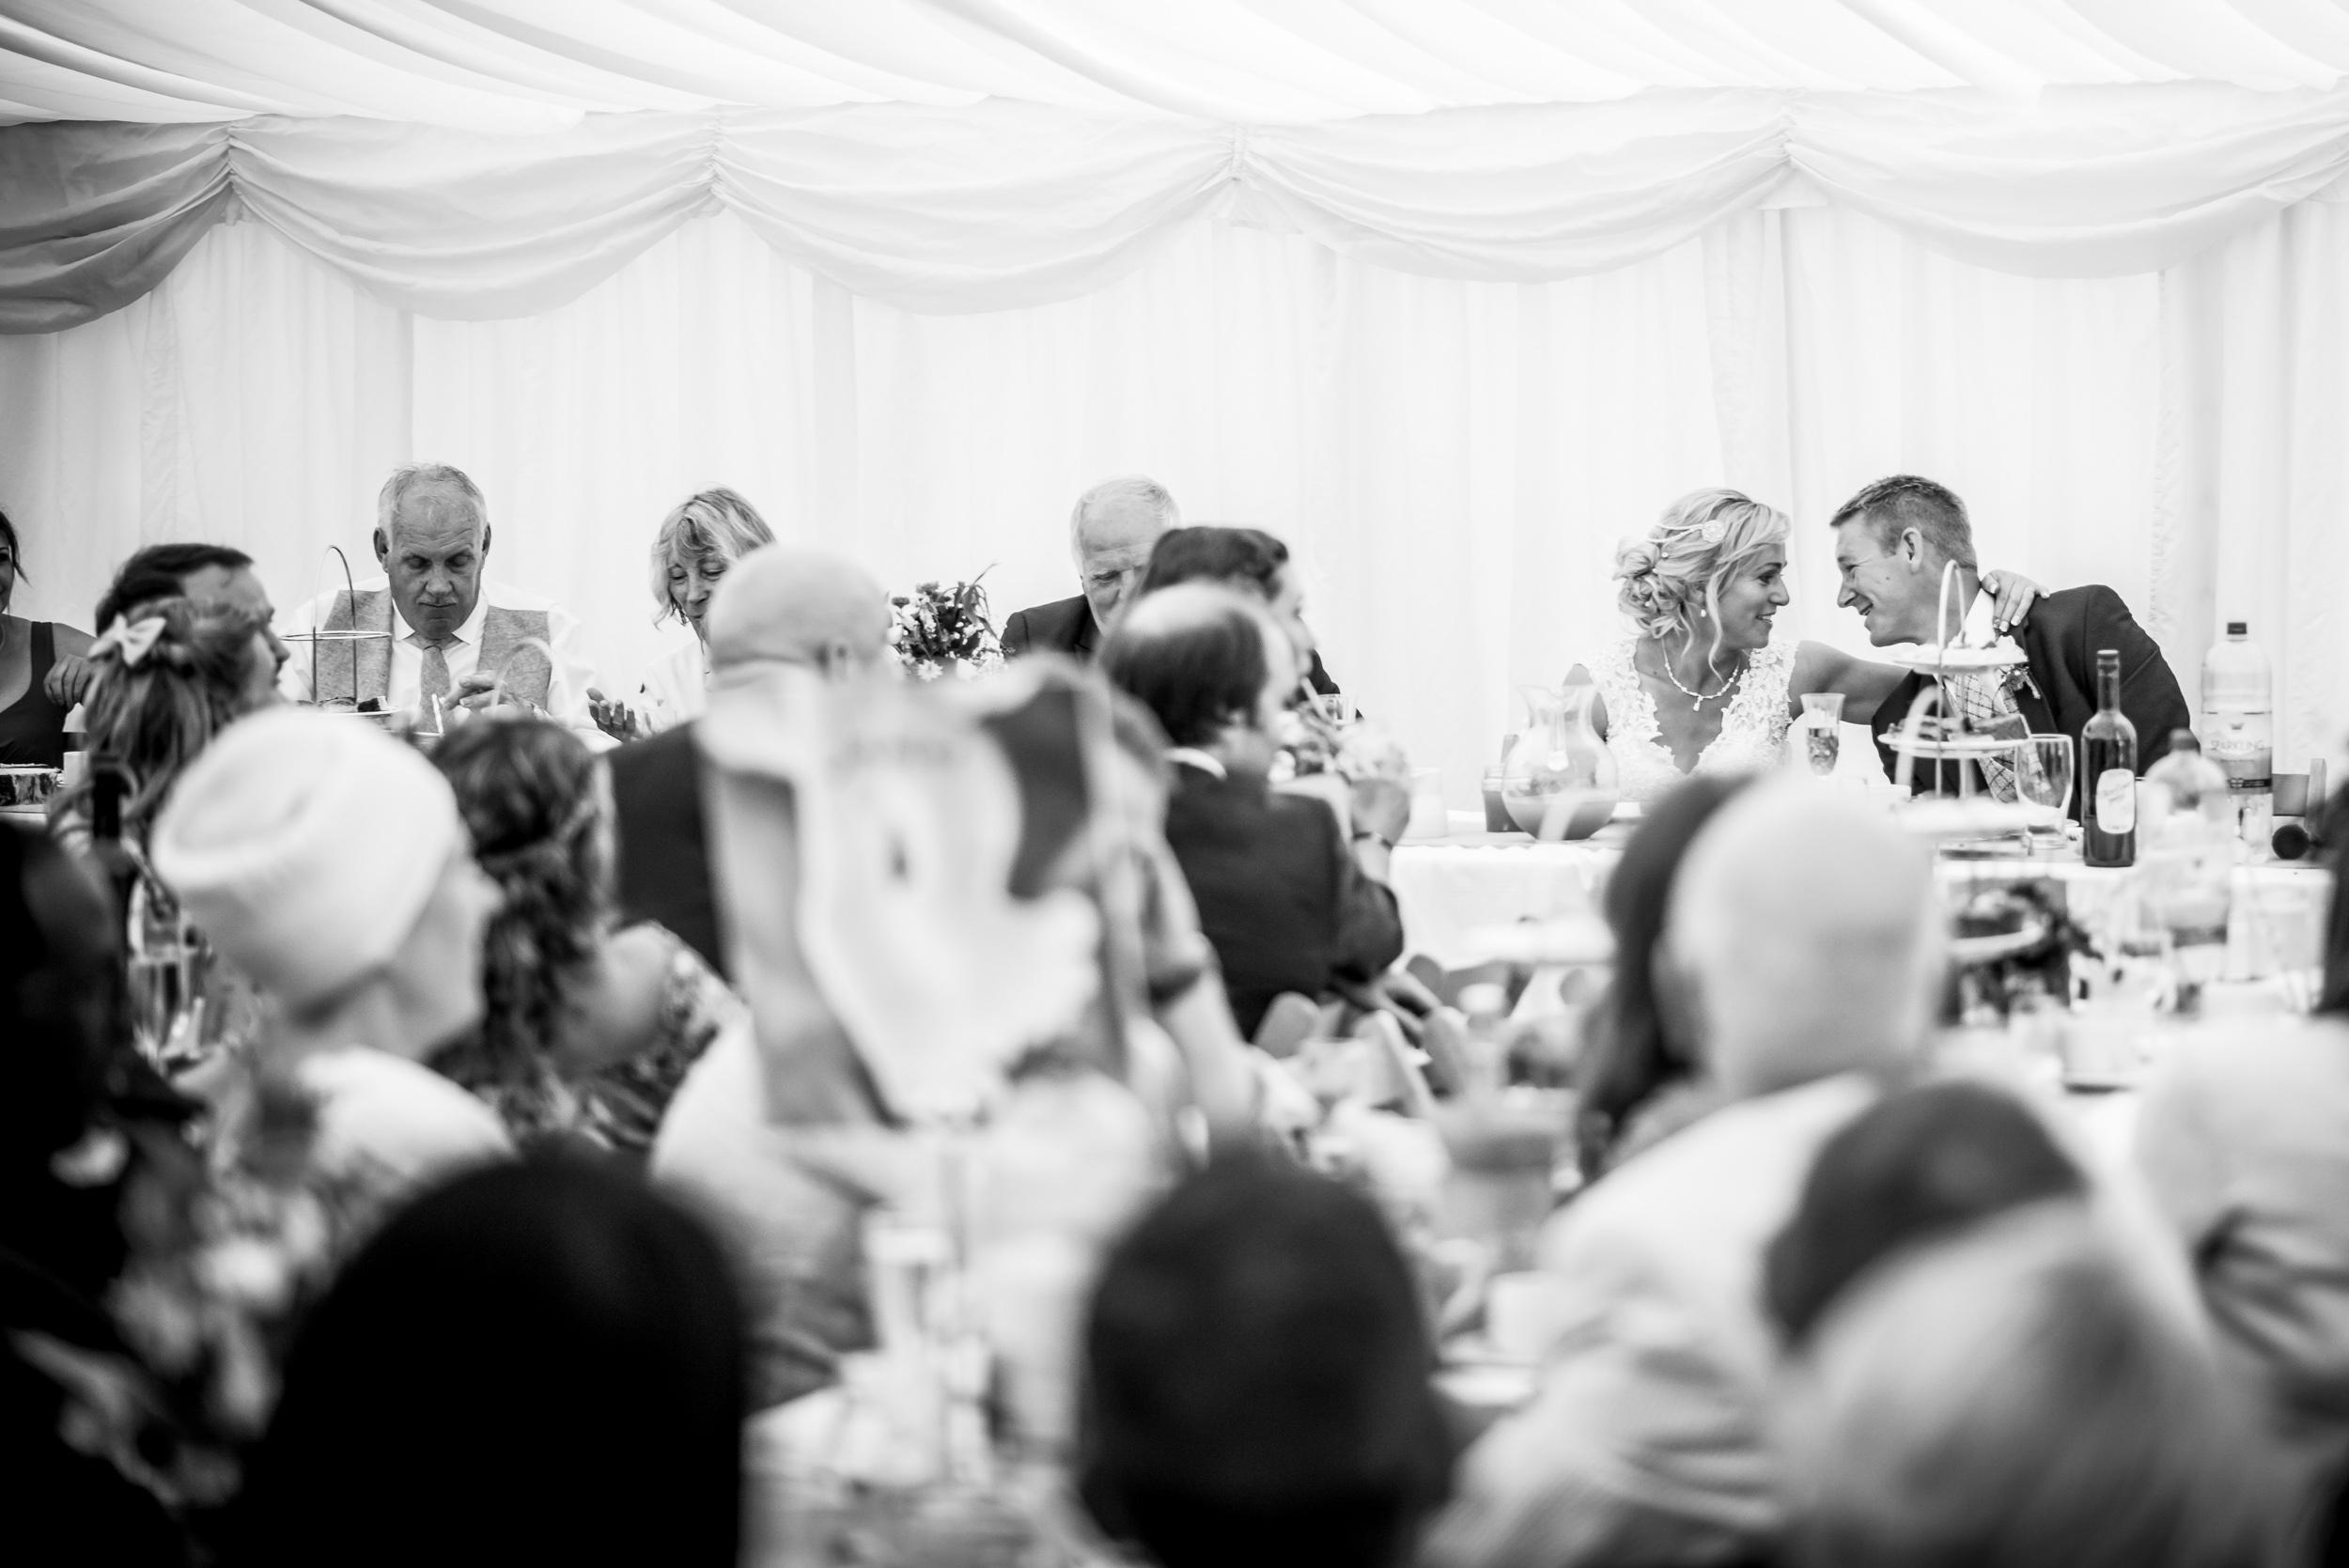 David Scholes Lancashire wedding photography 2016-64.jpg